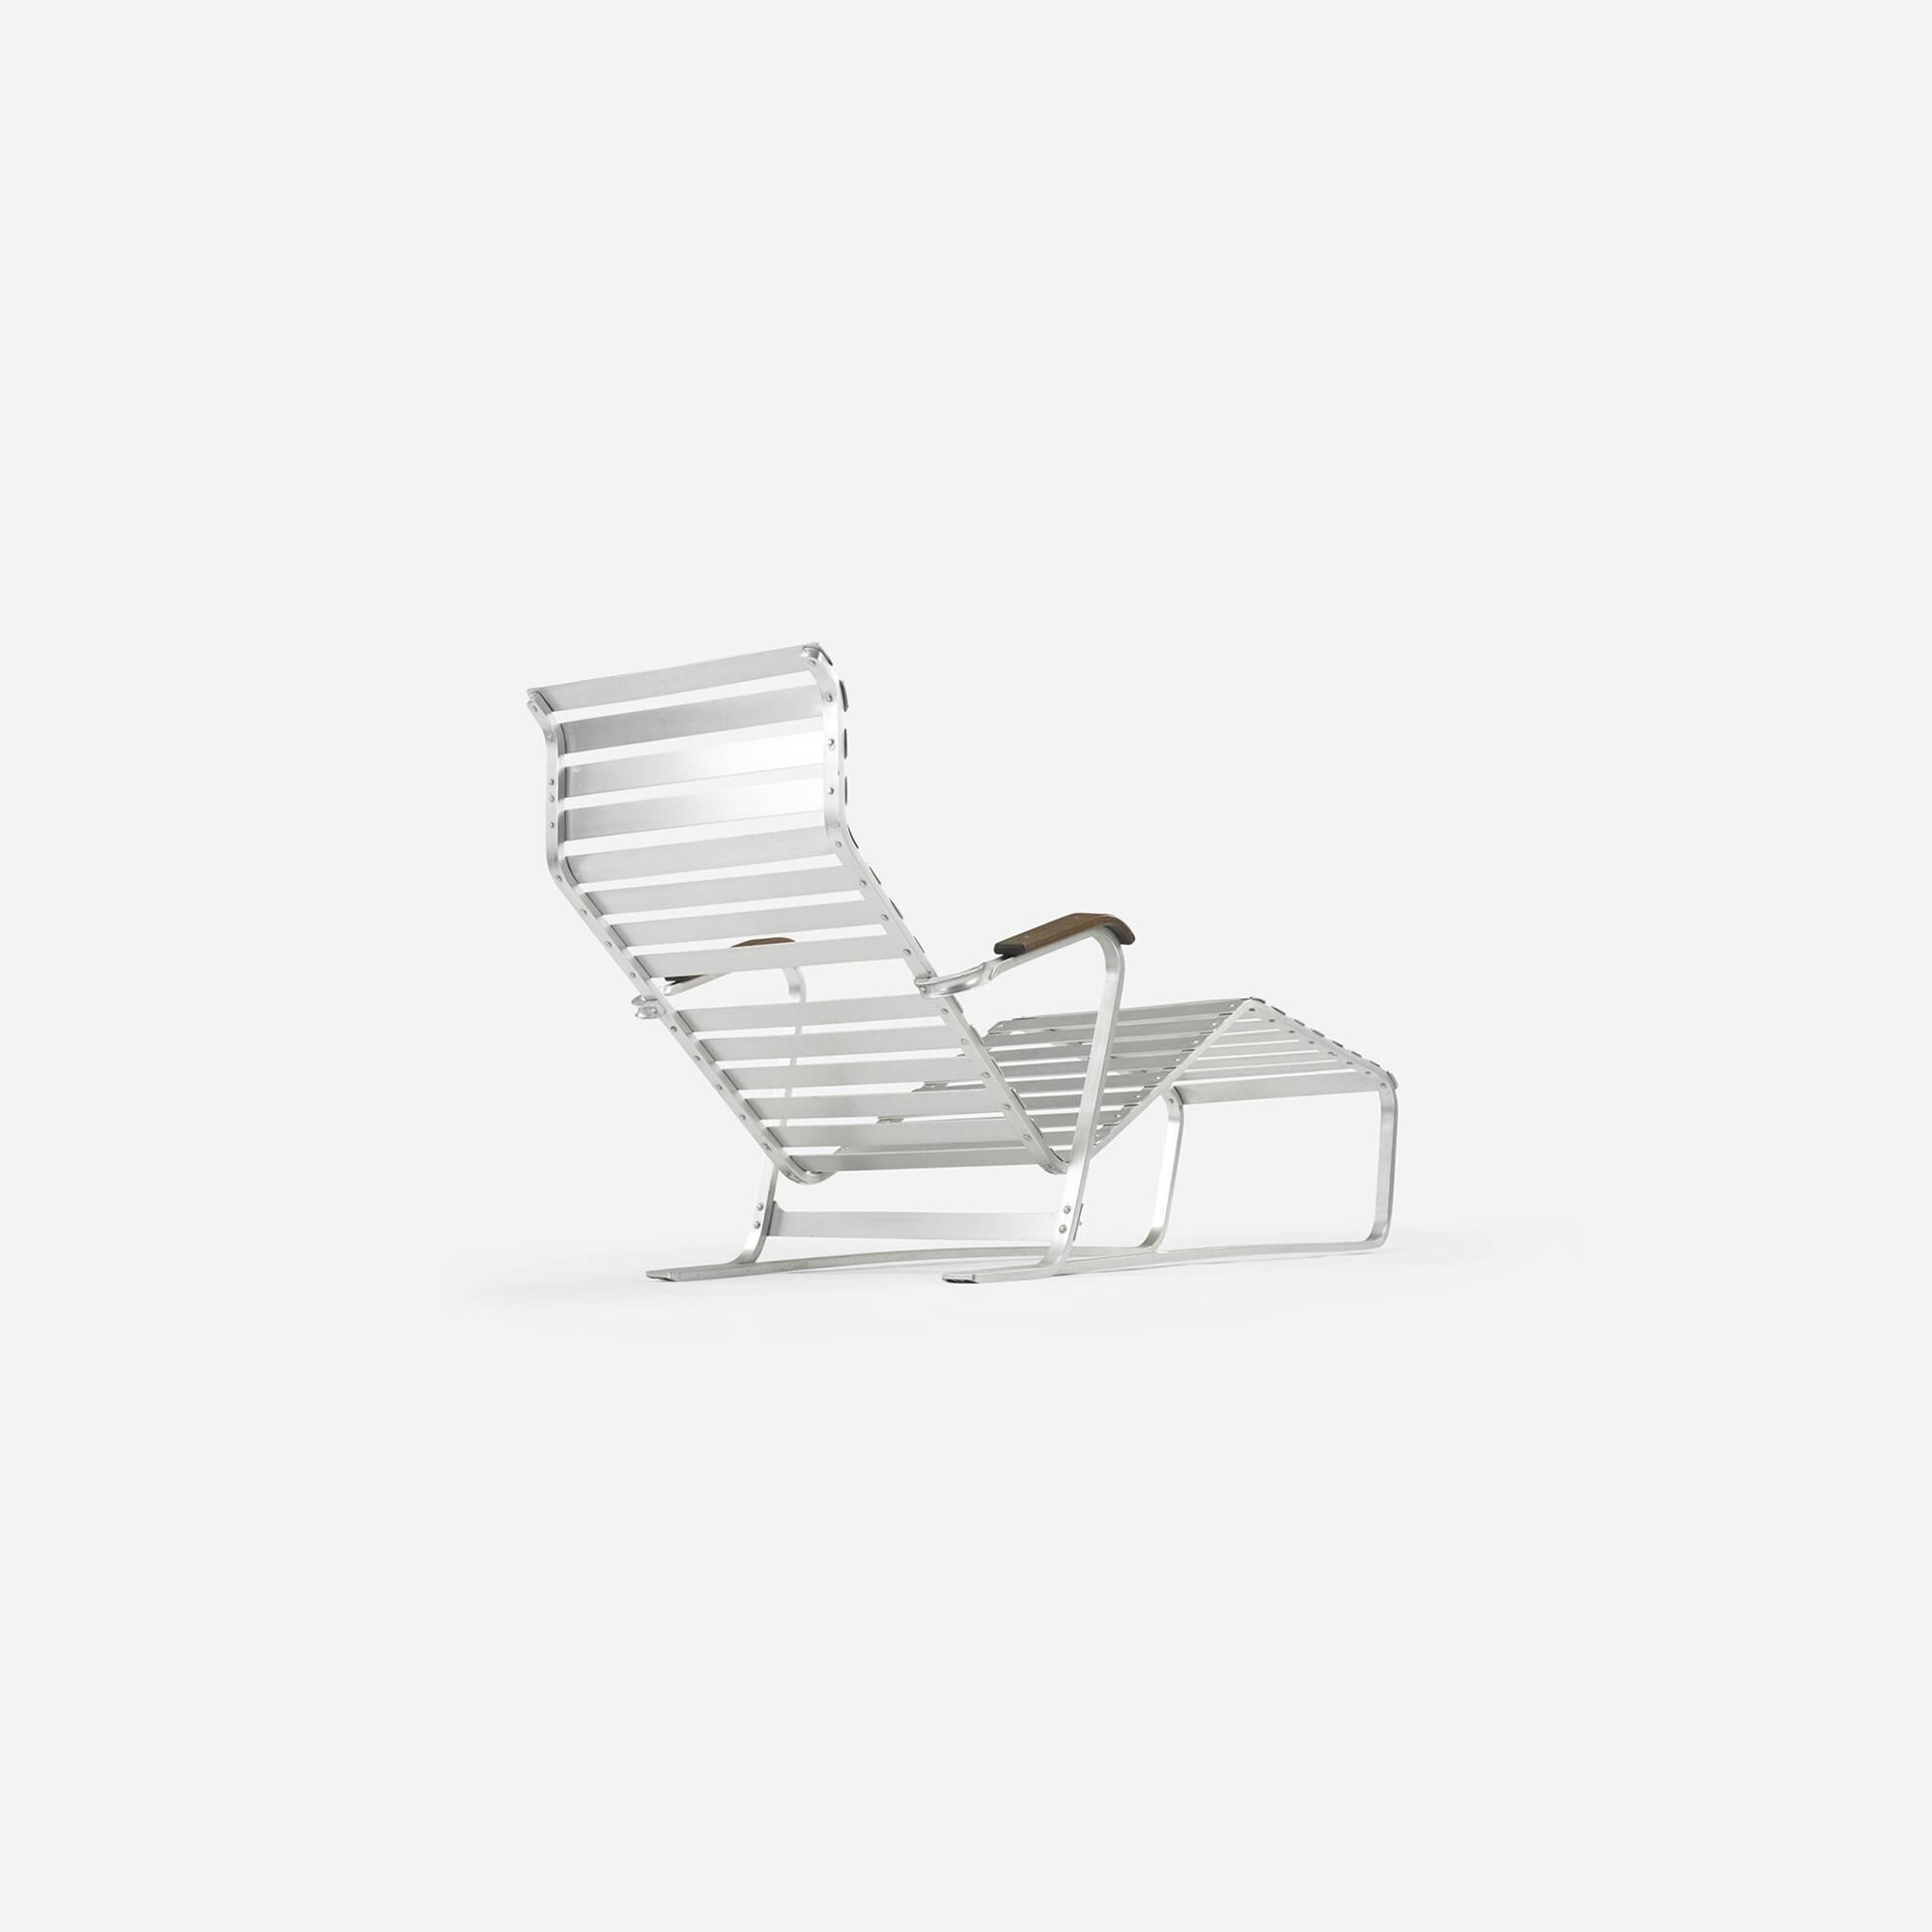 282 marcel breuer chaise lounge model 313. Black Bedroom Furniture Sets. Home Design Ideas